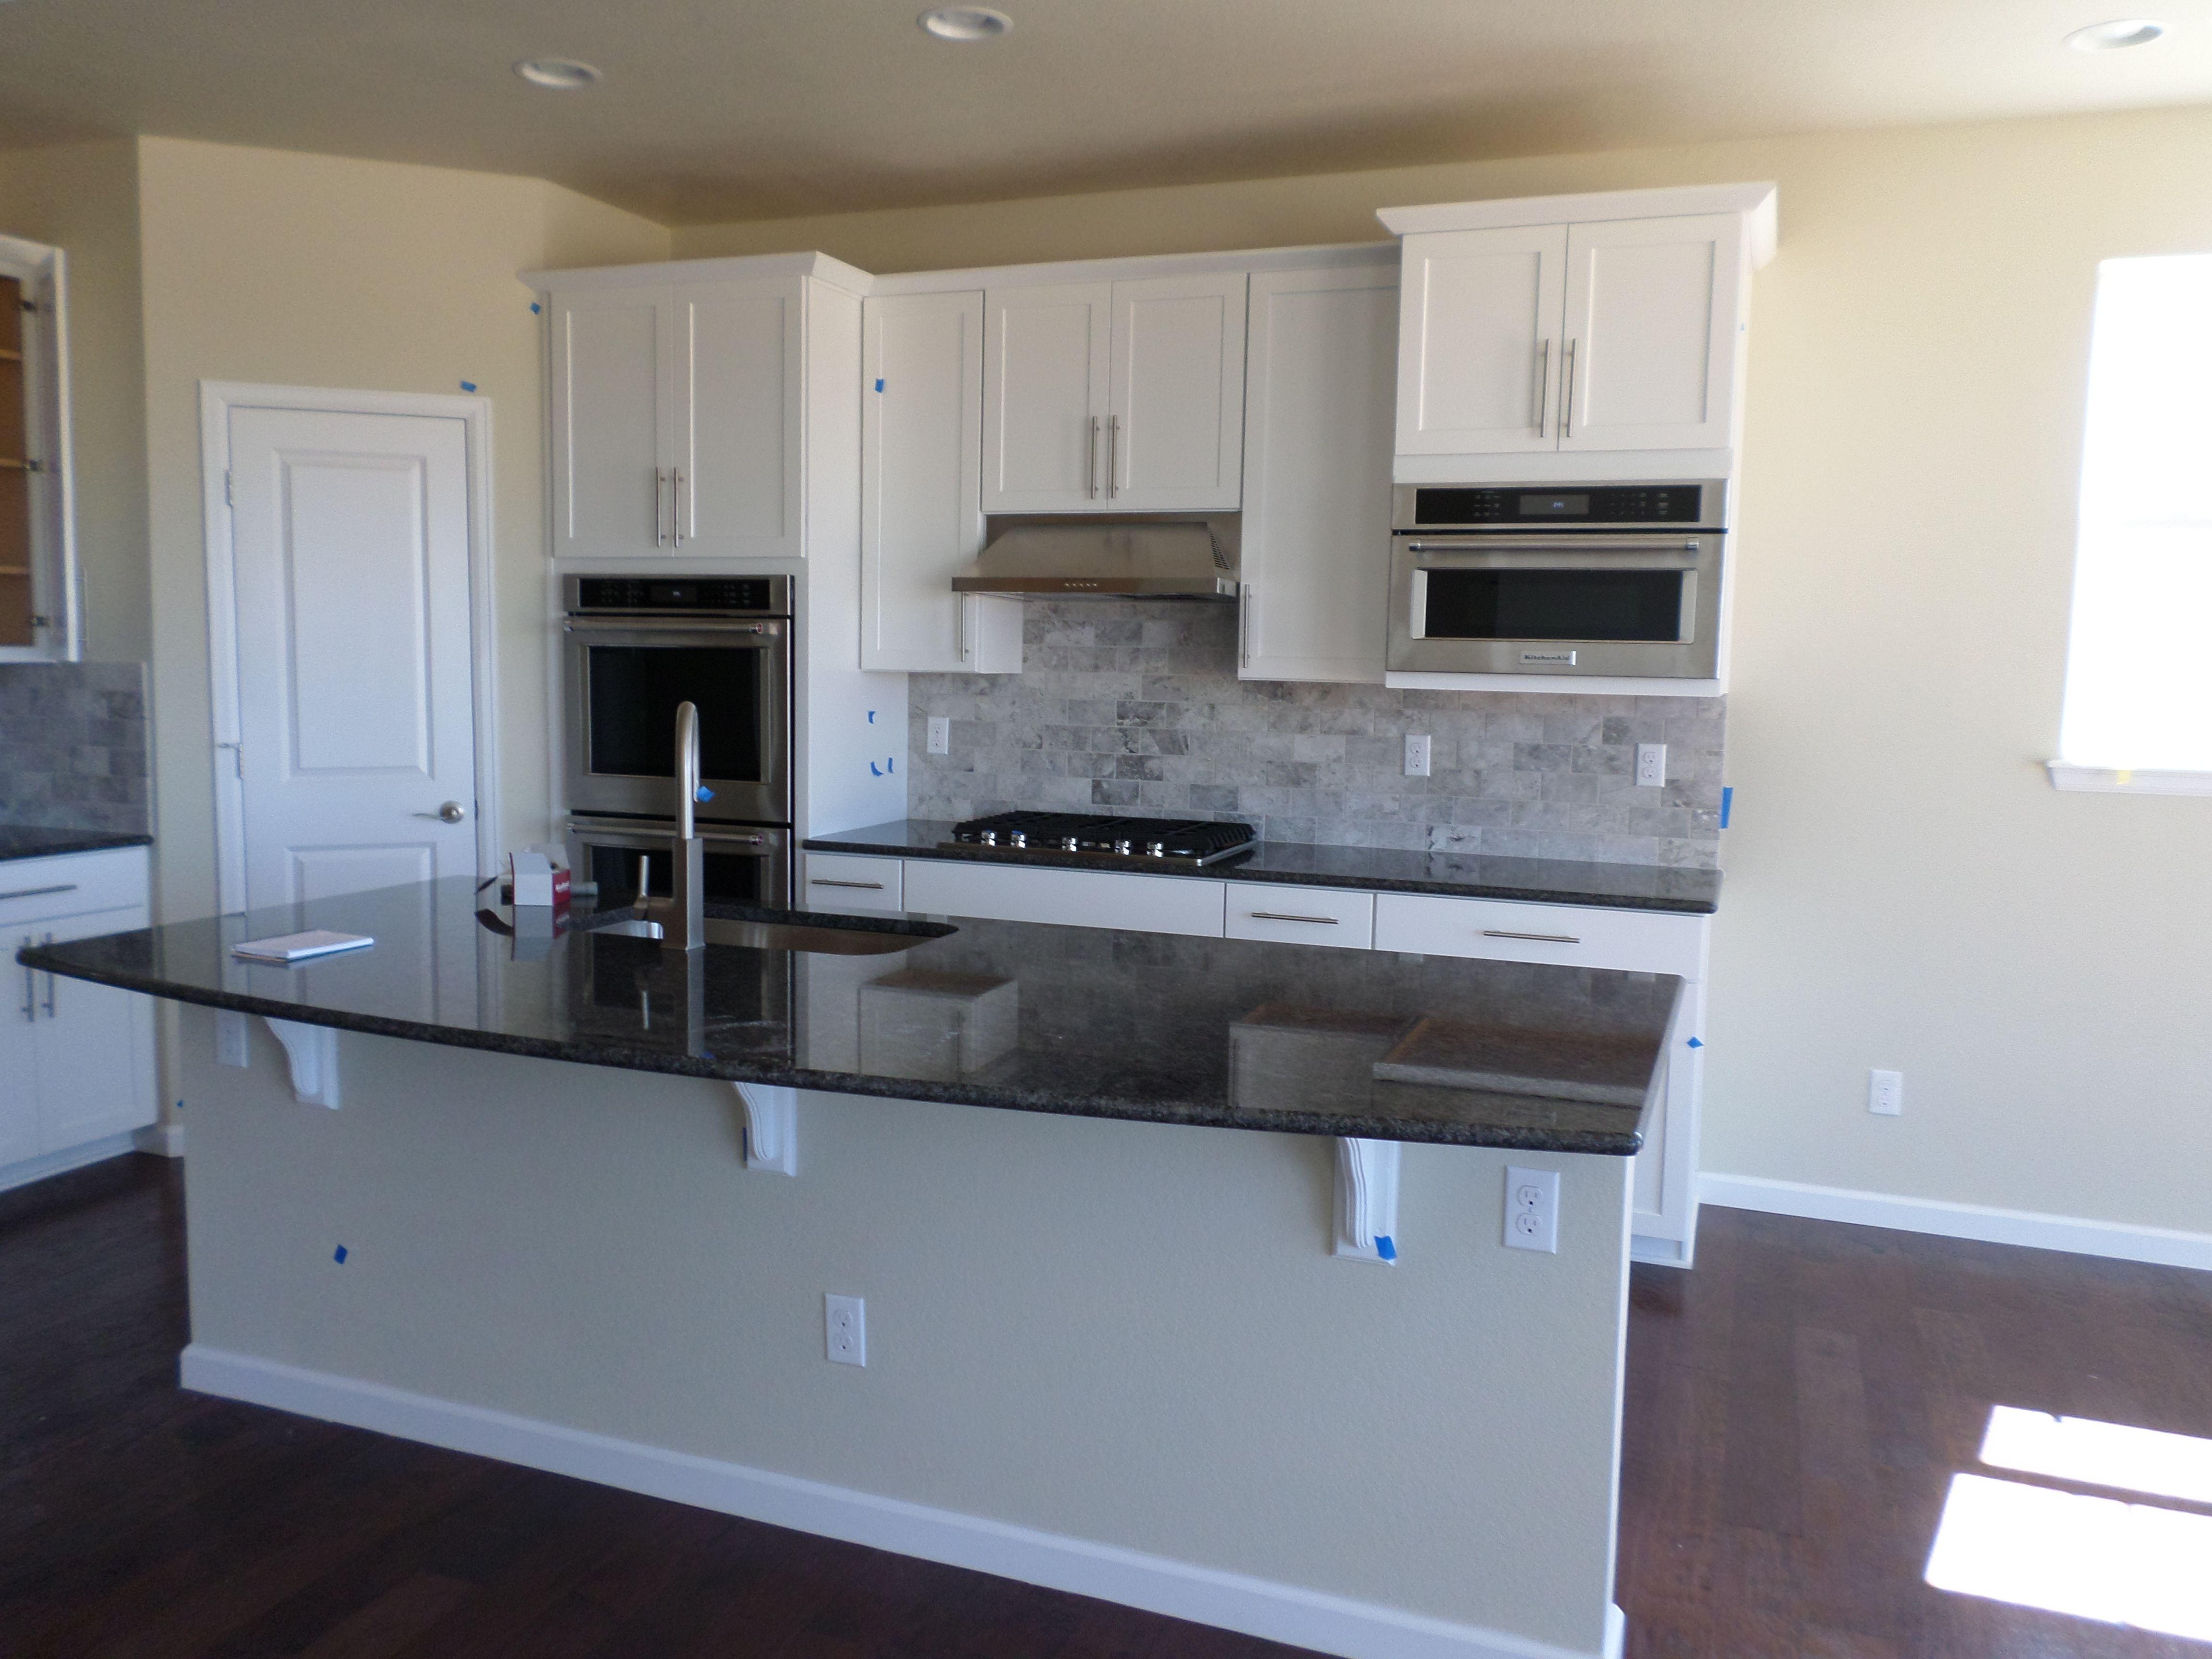 Merveilleux Timberlake Sonoma Painted Linen Cabinets, Silver Pearl Granite Slab, Shaw  Richland Hardwood Floors U0026